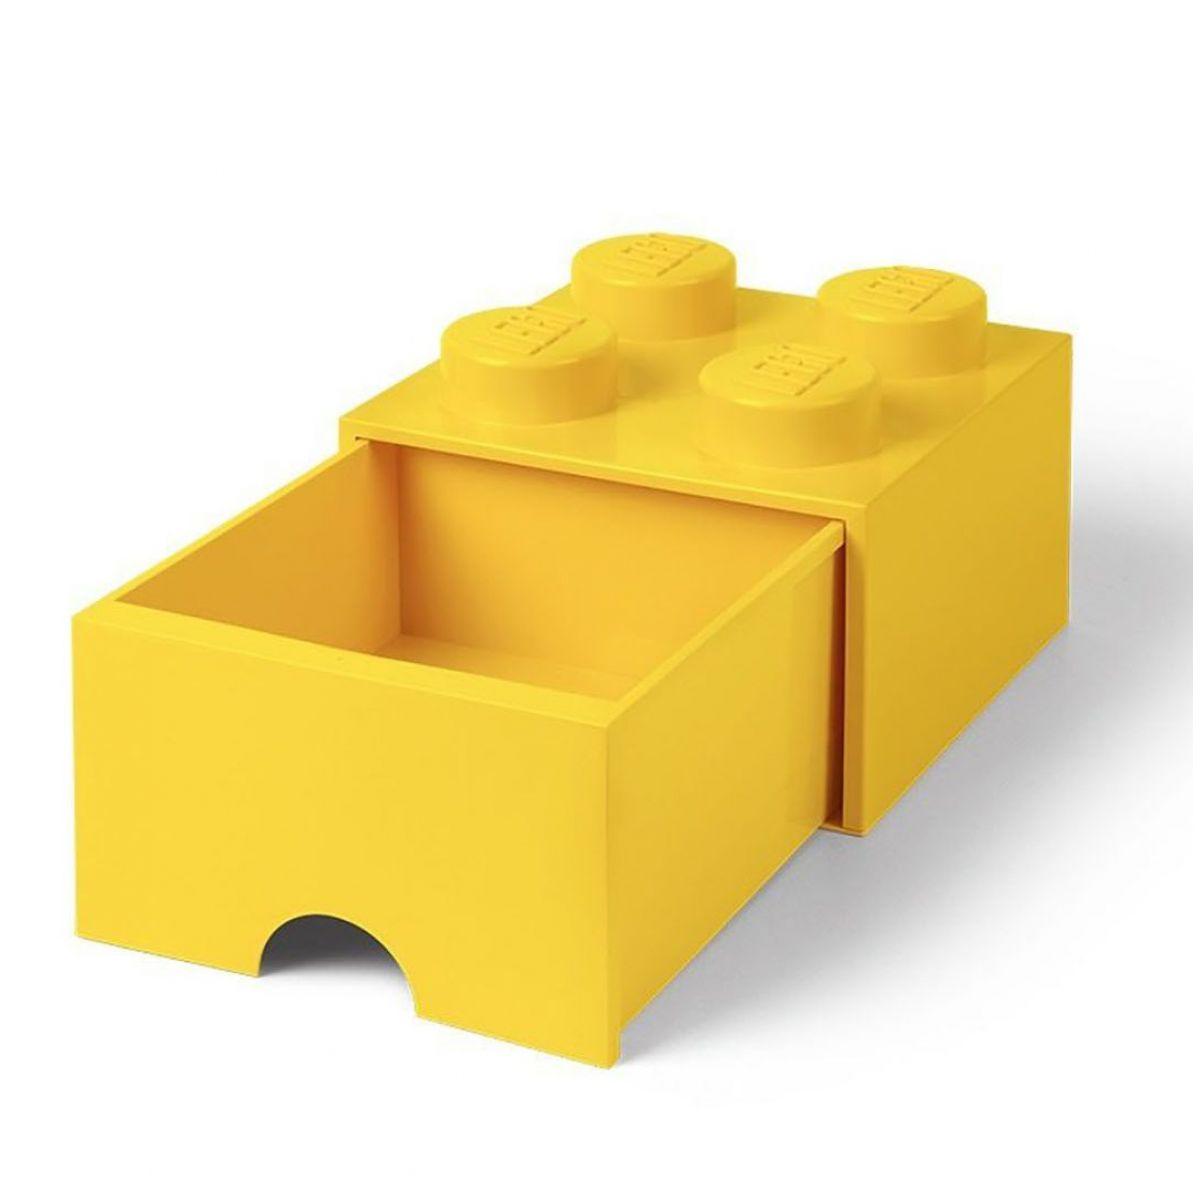 LEGO úložný box 4 s šuplíkem - žlutá